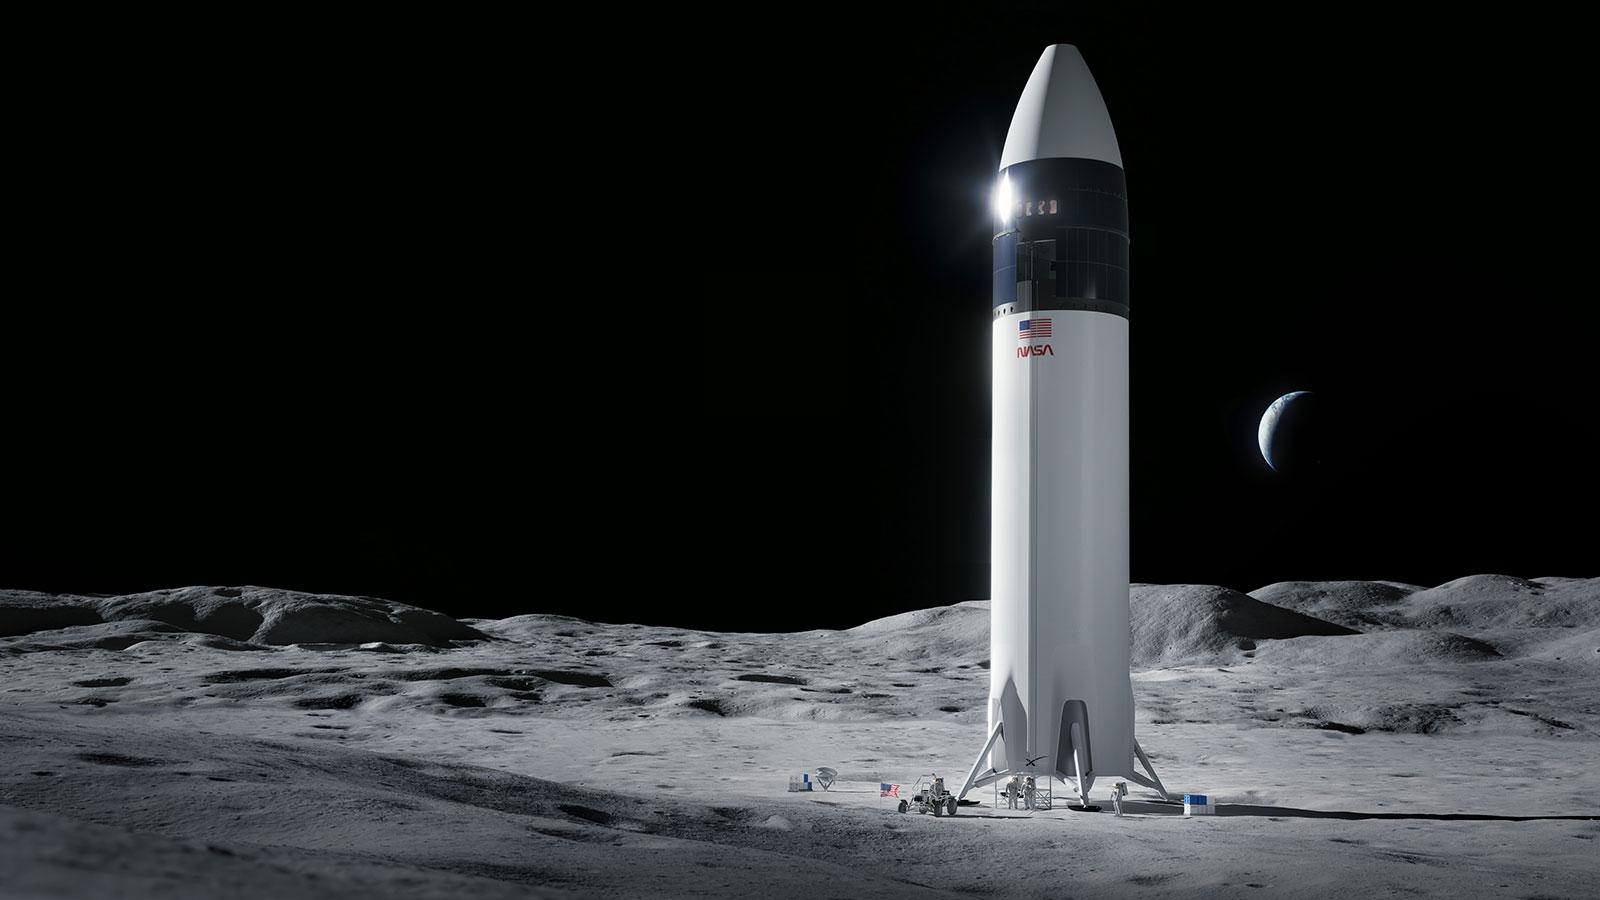 SpaceX wins NASA's Artemis lunar lander contract